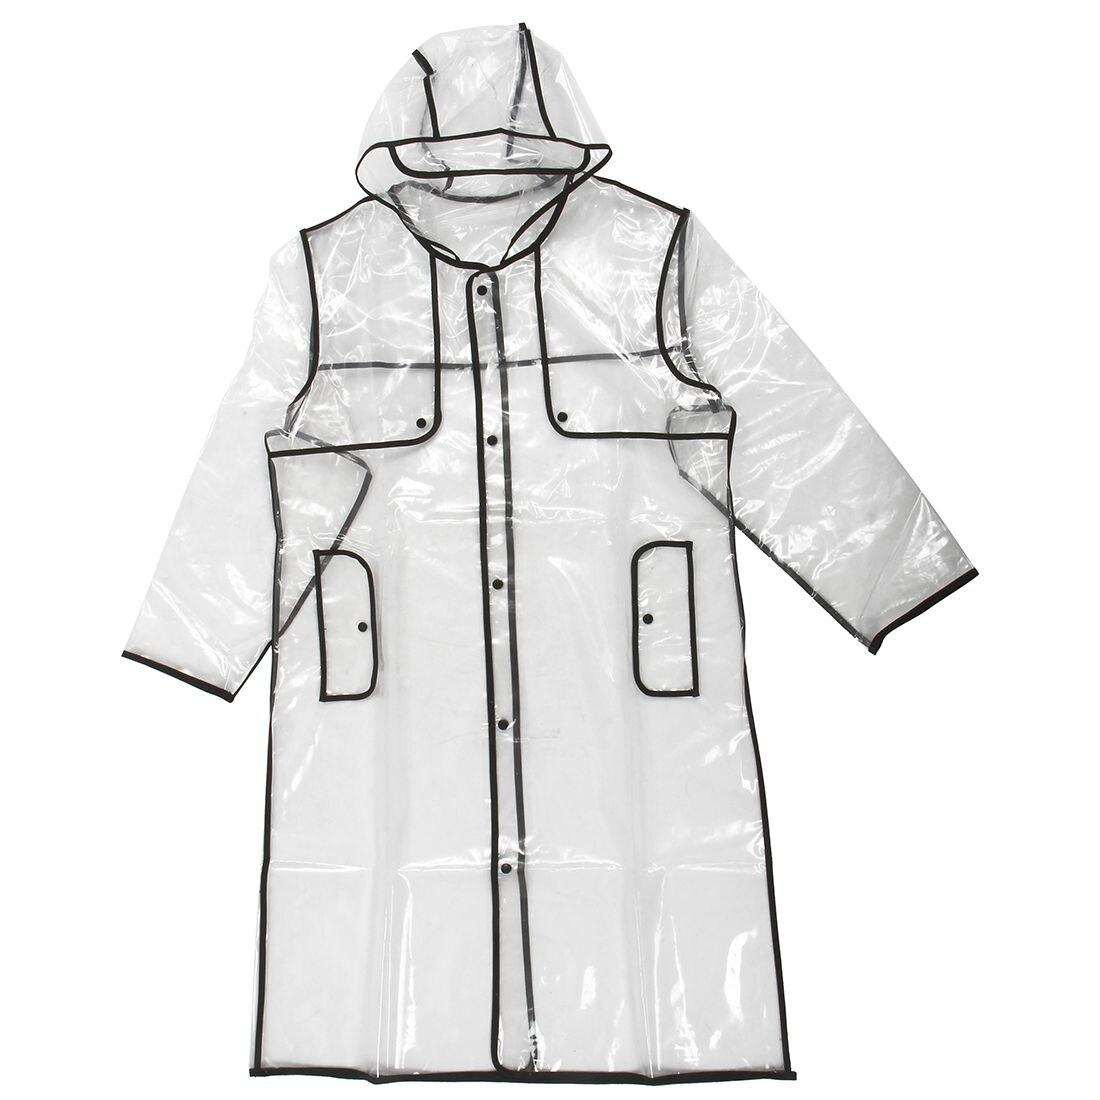 EVA Outdoor Raincoat Lightweight Transparent Fashion Cuff Button Waterproof